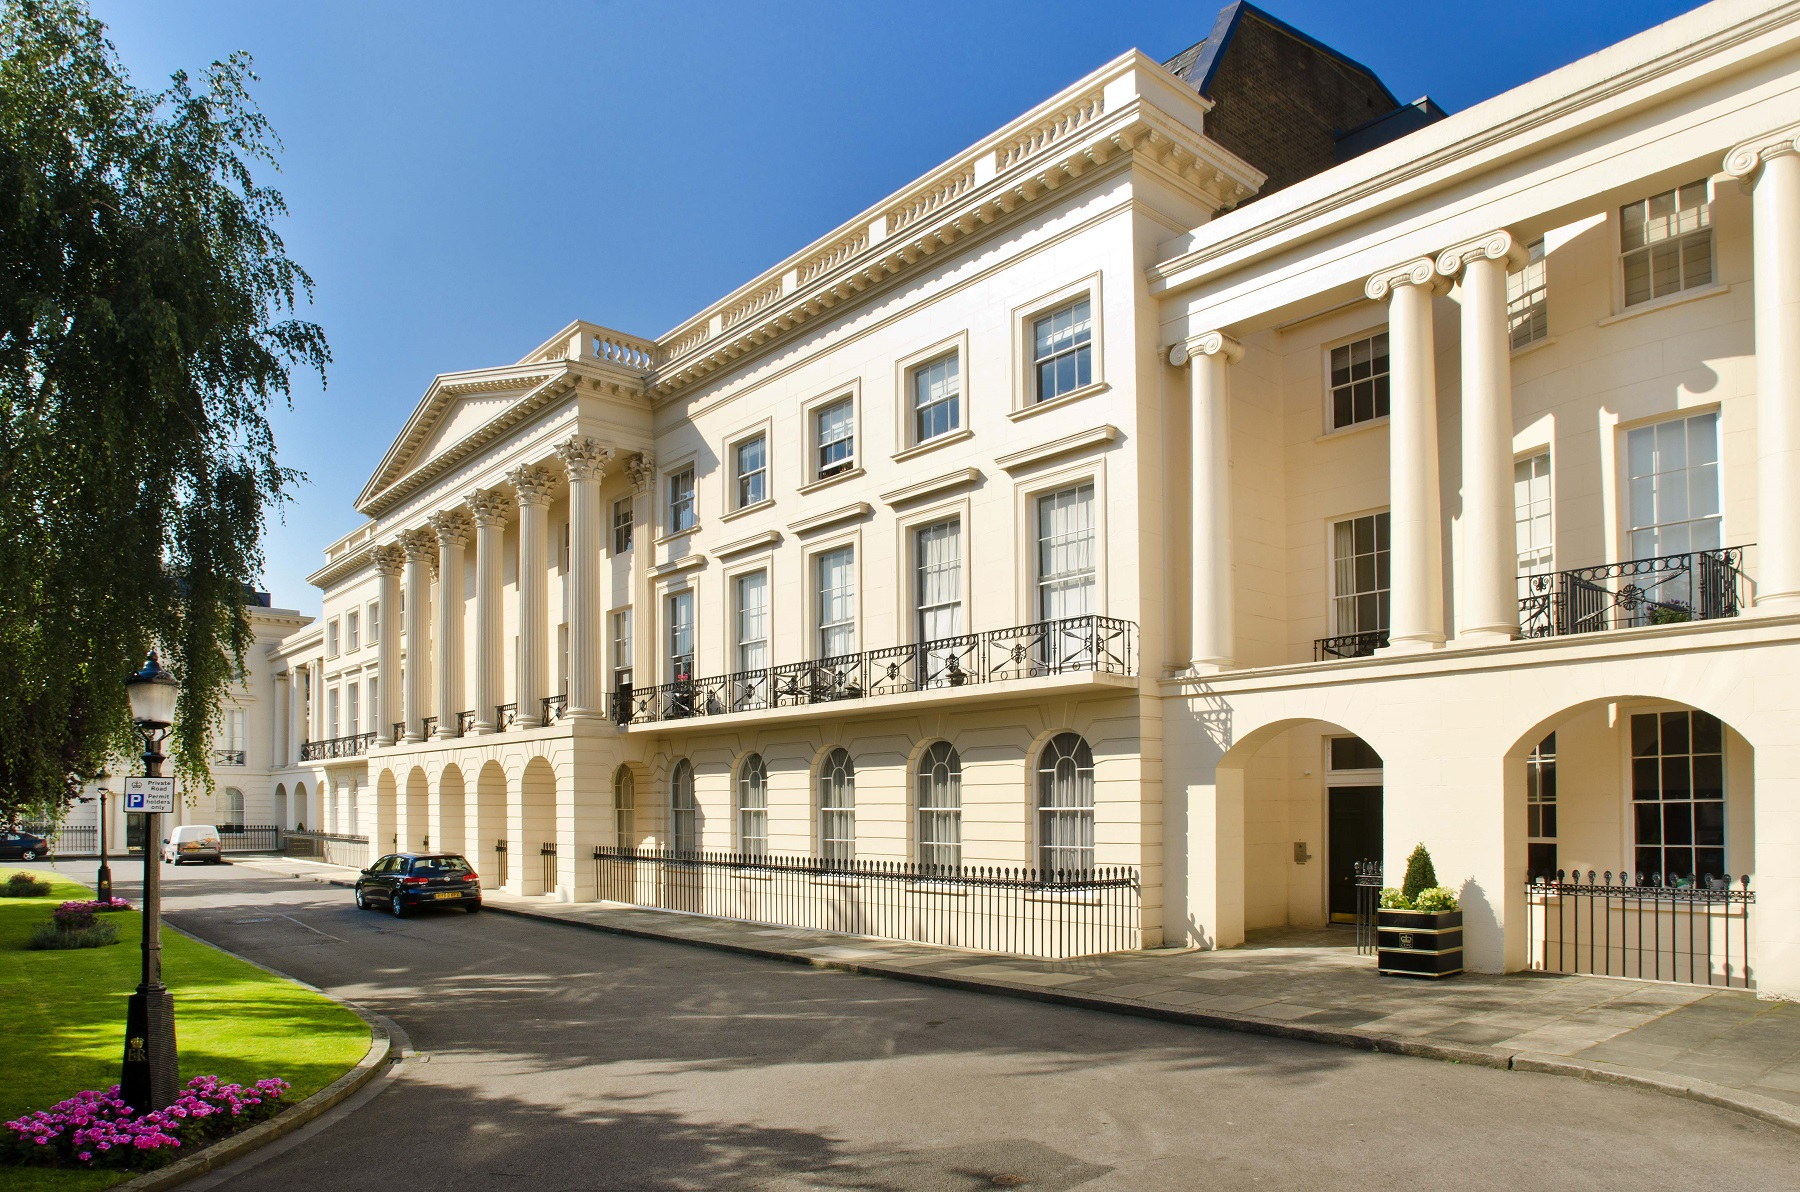 Квартира для того Продажа на Clarence Terrace London, Англия NW14RD Великобритания